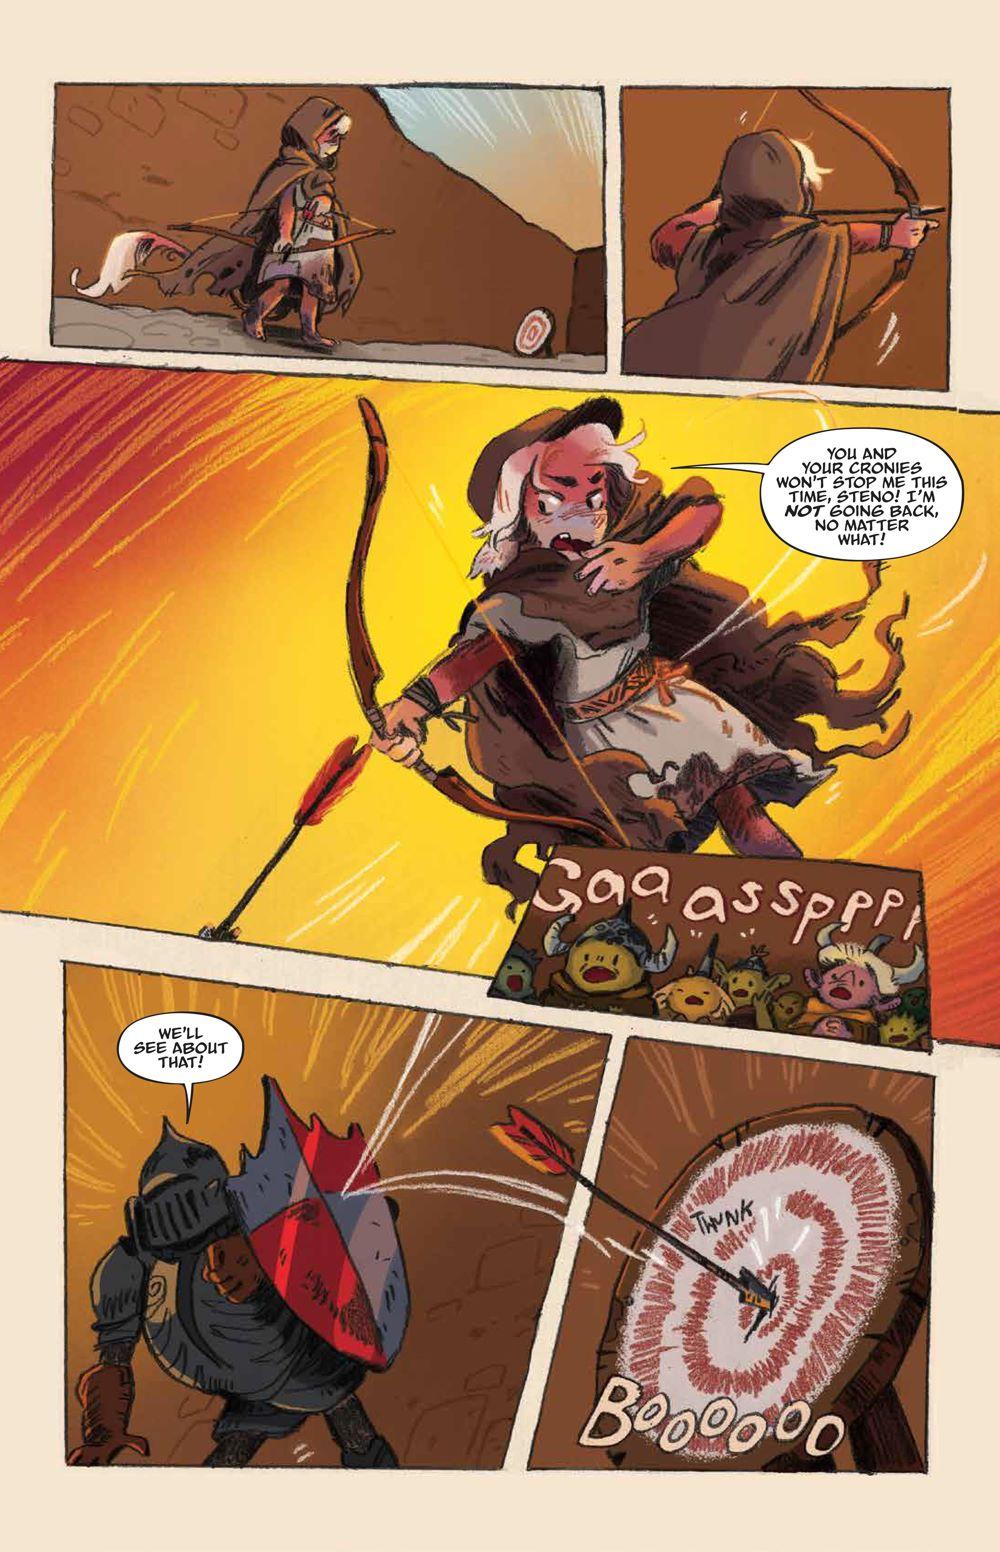 Labyrinth_UnderSpell_HC_PRESS_18 ComicList Previews: JIM HENSON'S LABYRINTH UNDER THE SPELL HC